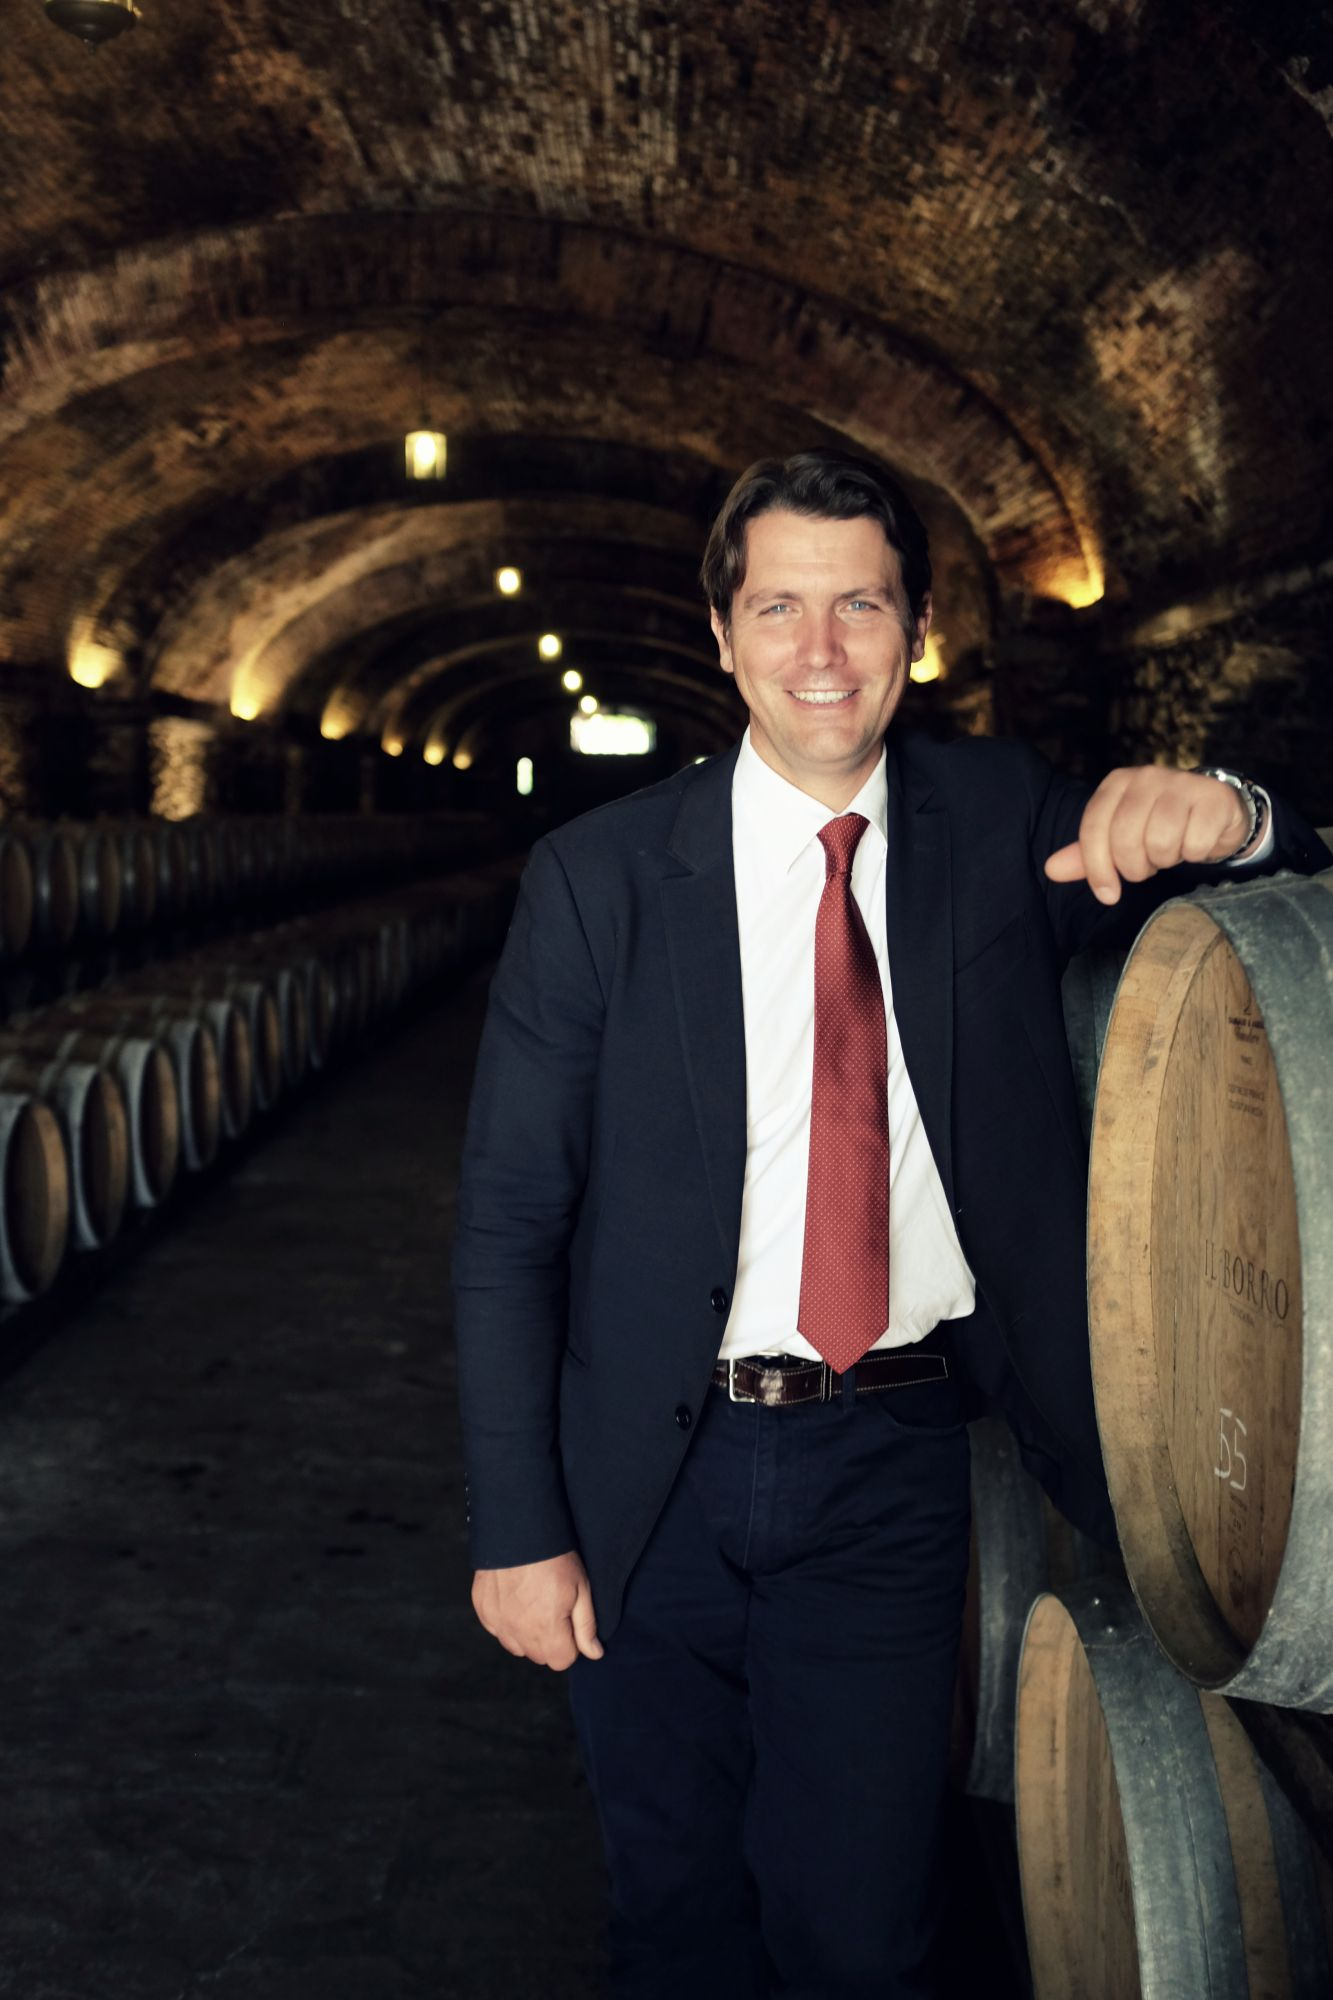 The Future Of Wine Is Organic, Says Salvatore Ferragamo